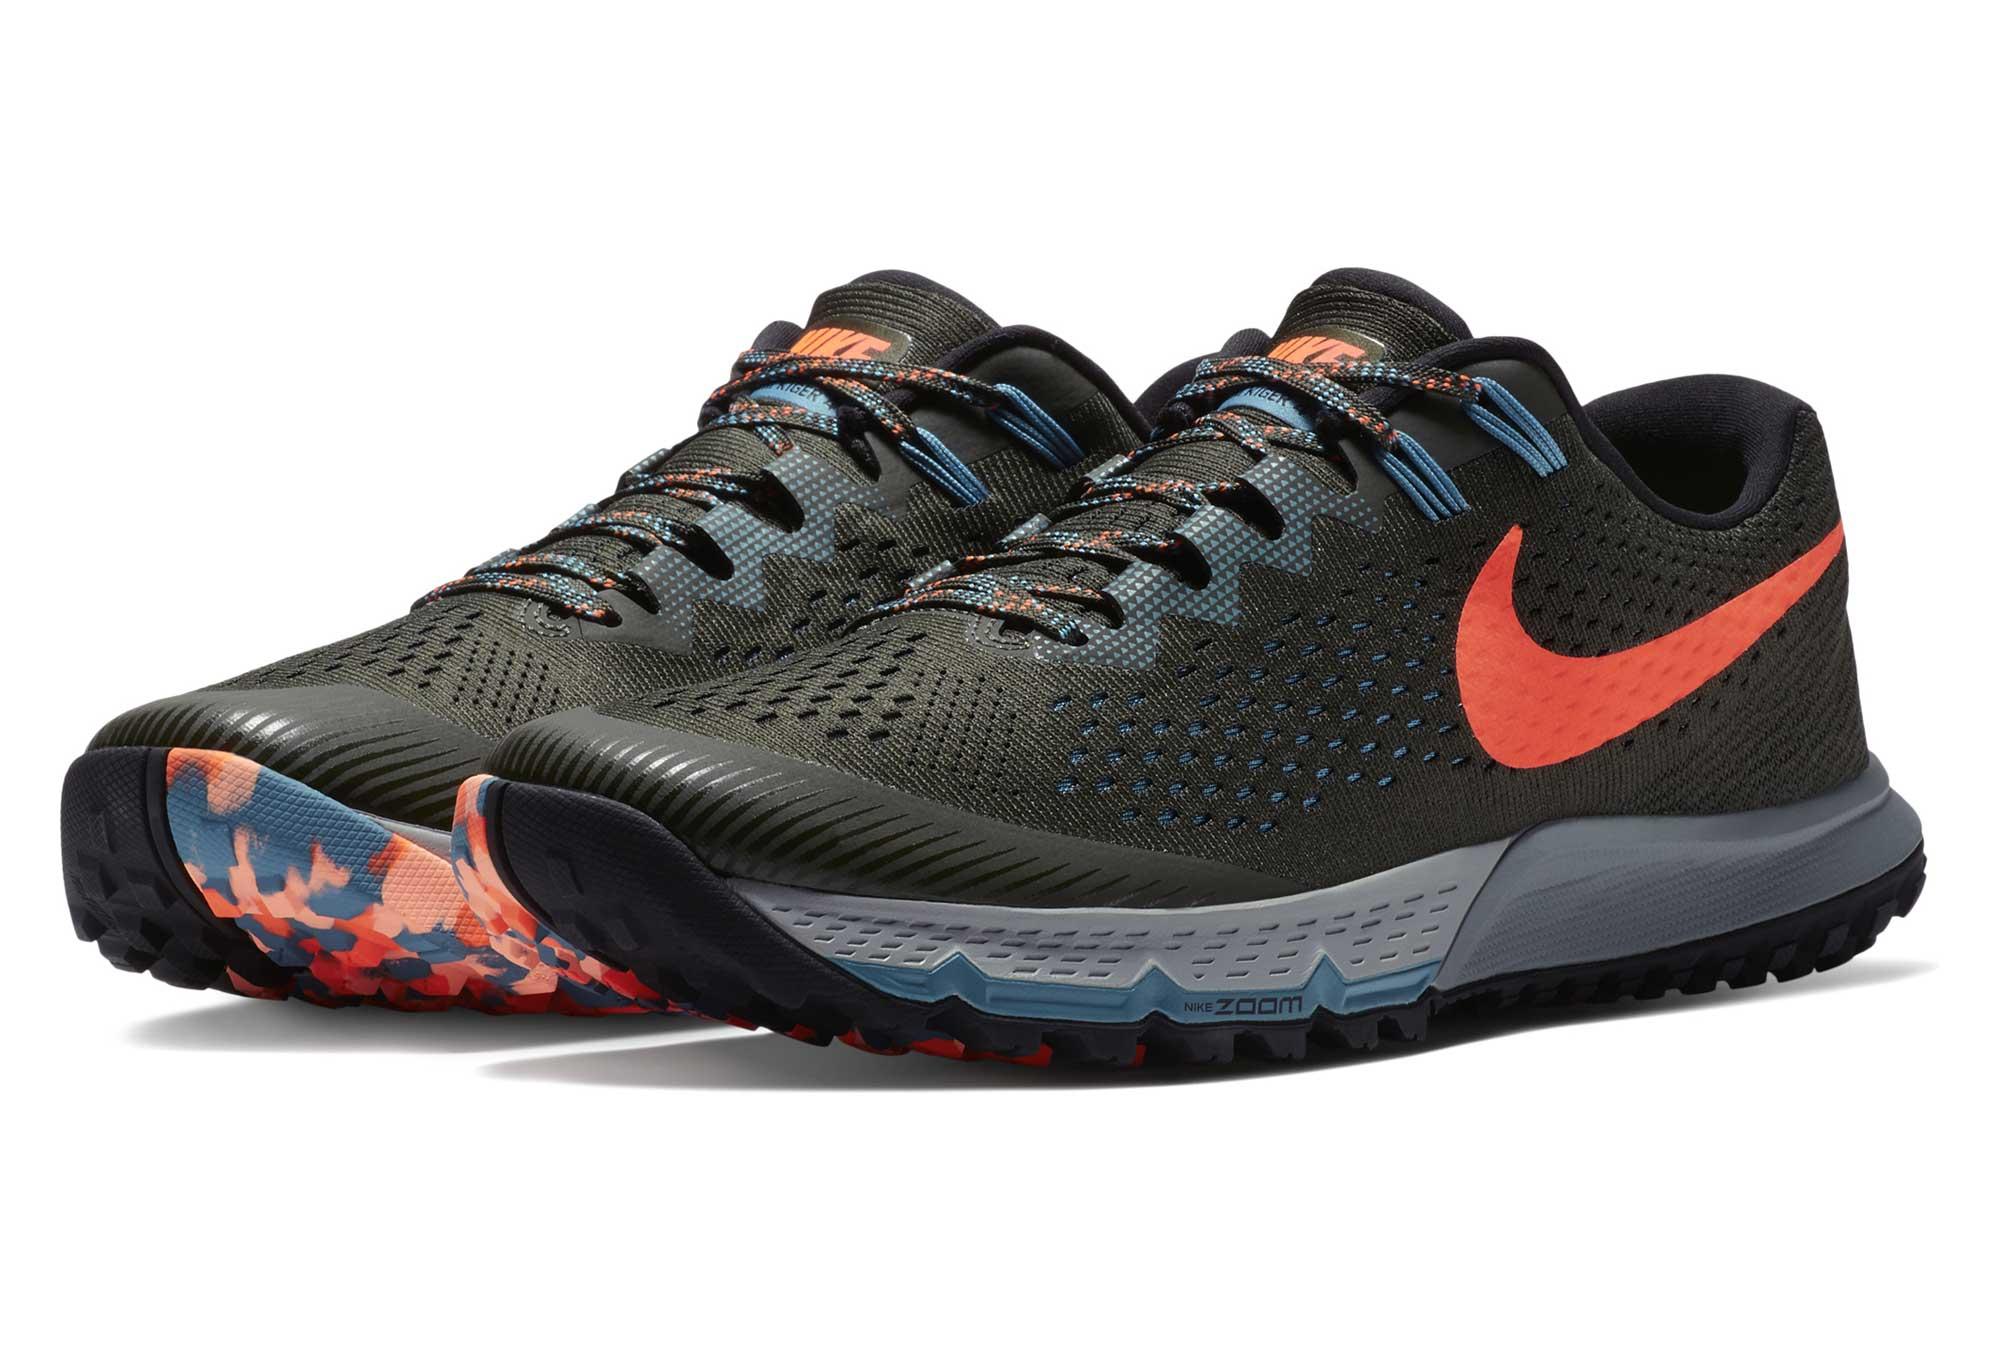 cheap for discount 5077b 5fecf Nike Air Zoom Terra Kiger 4 Khaki Orange Men